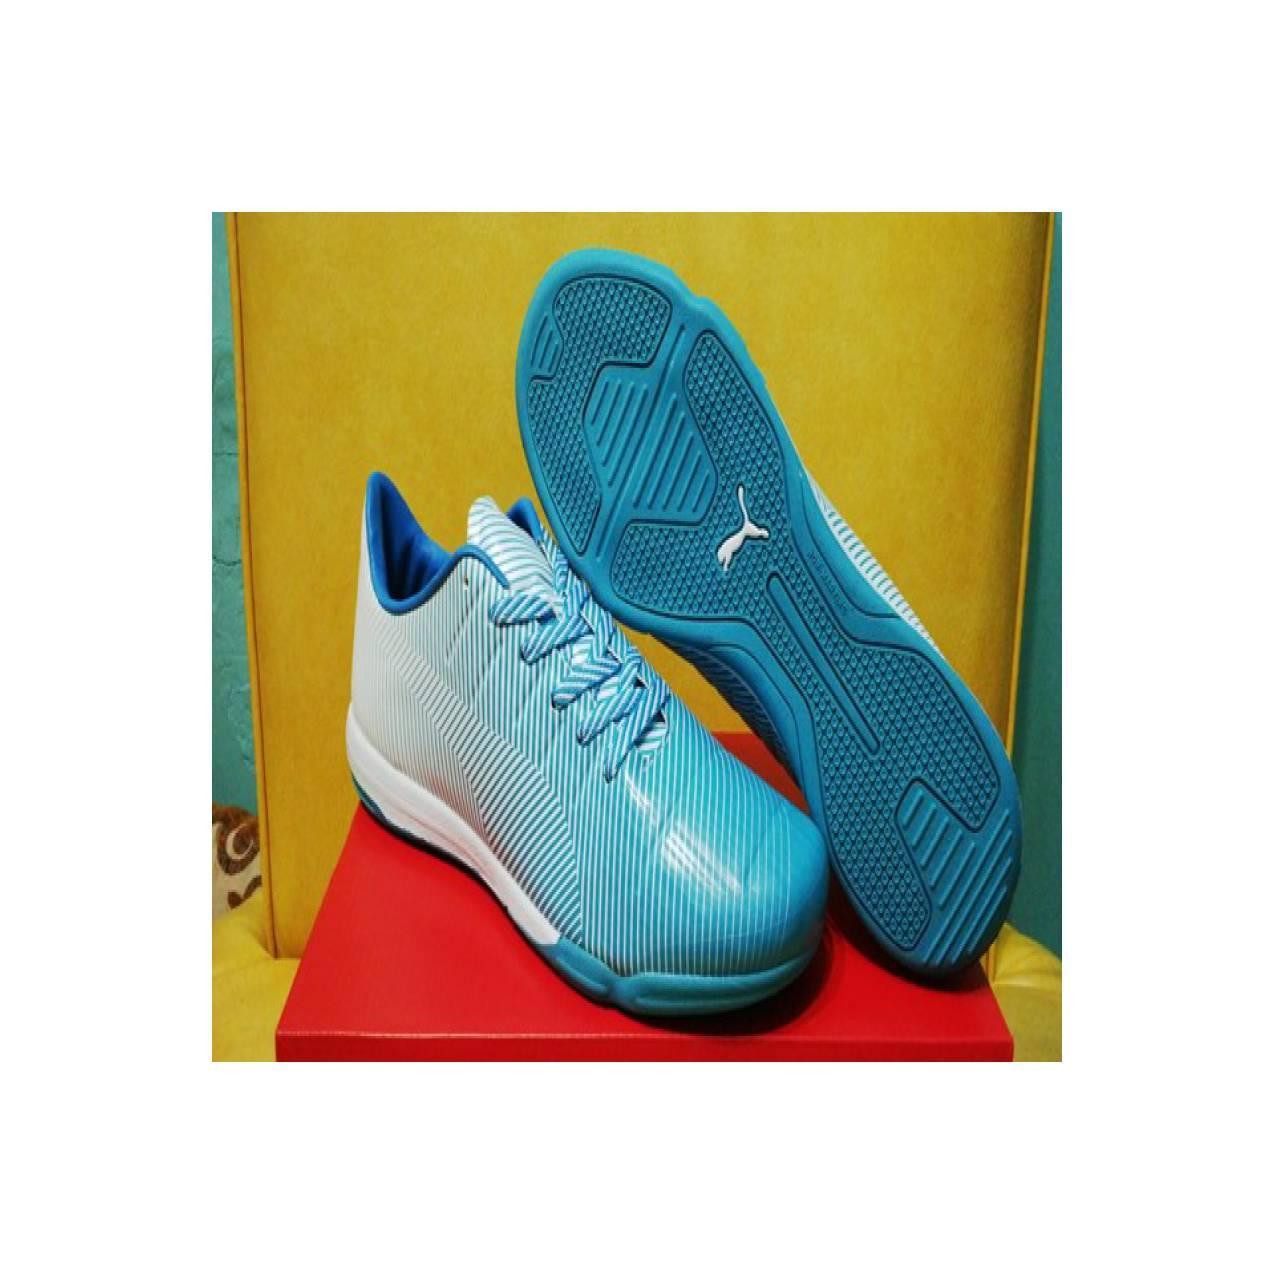 Sepatu Futsal Puma Evopower 1.3 Camo Blue